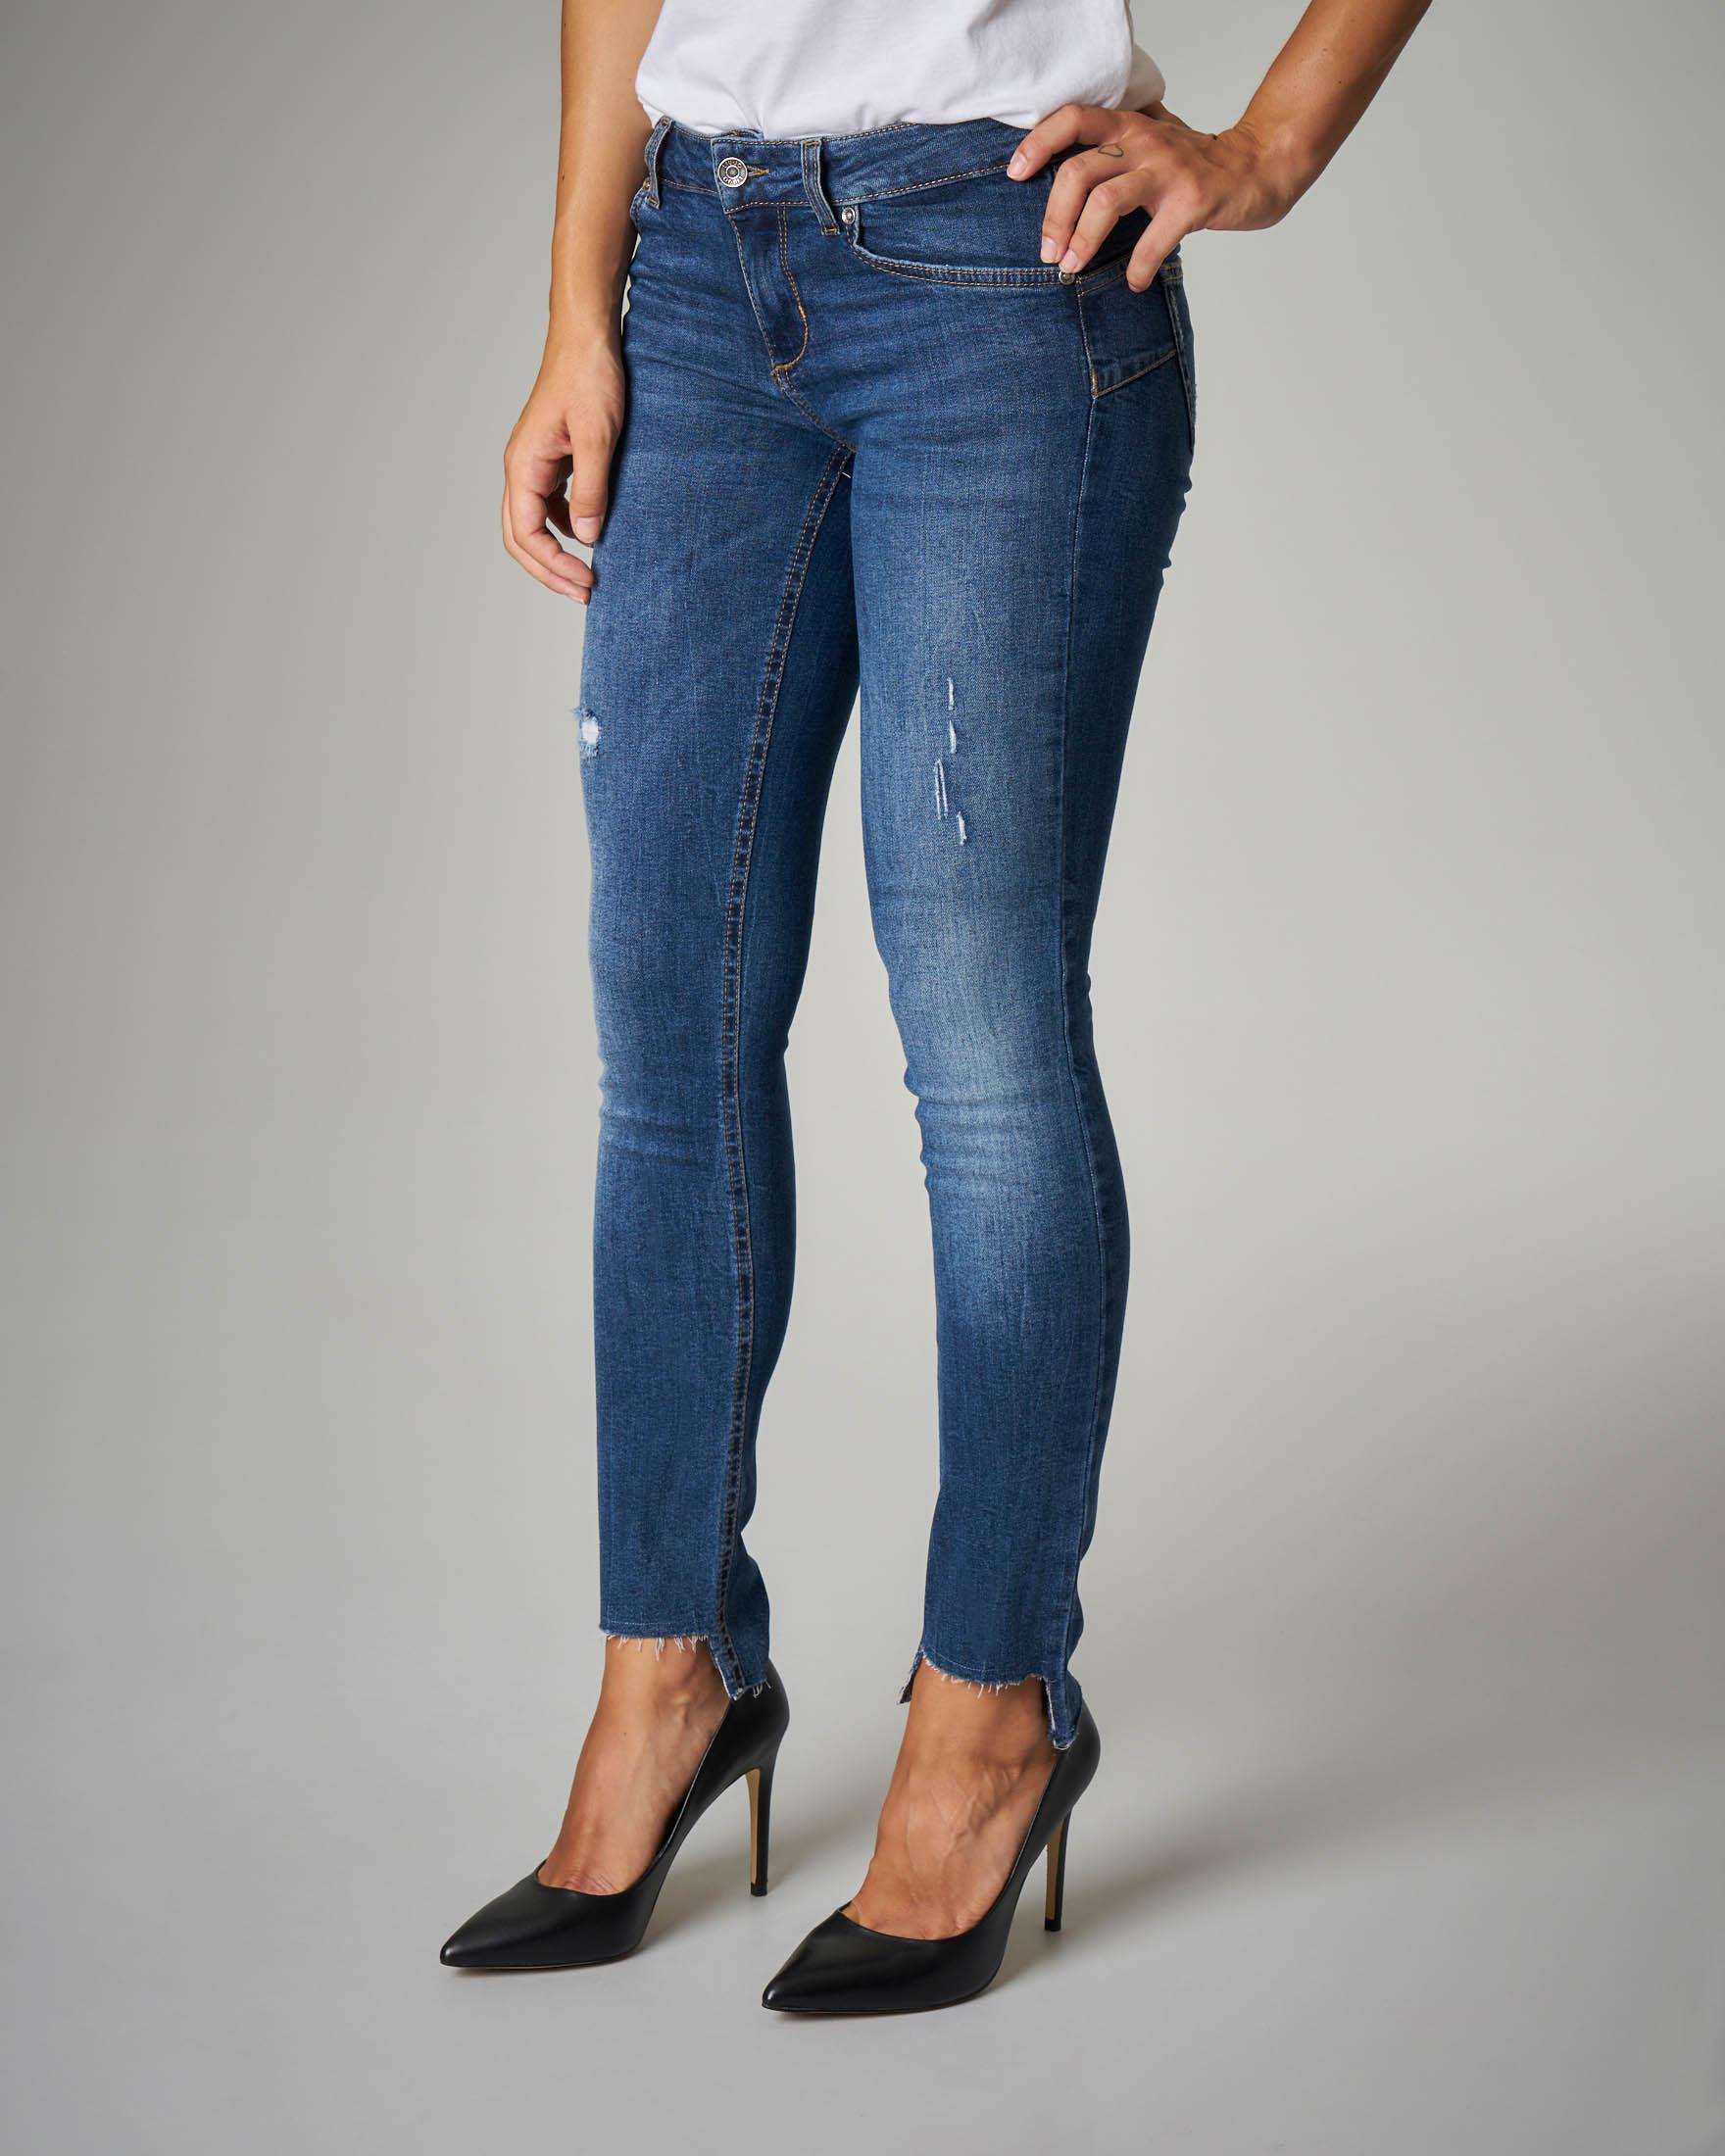 Jeans Bottom Up blu con orli irregolari